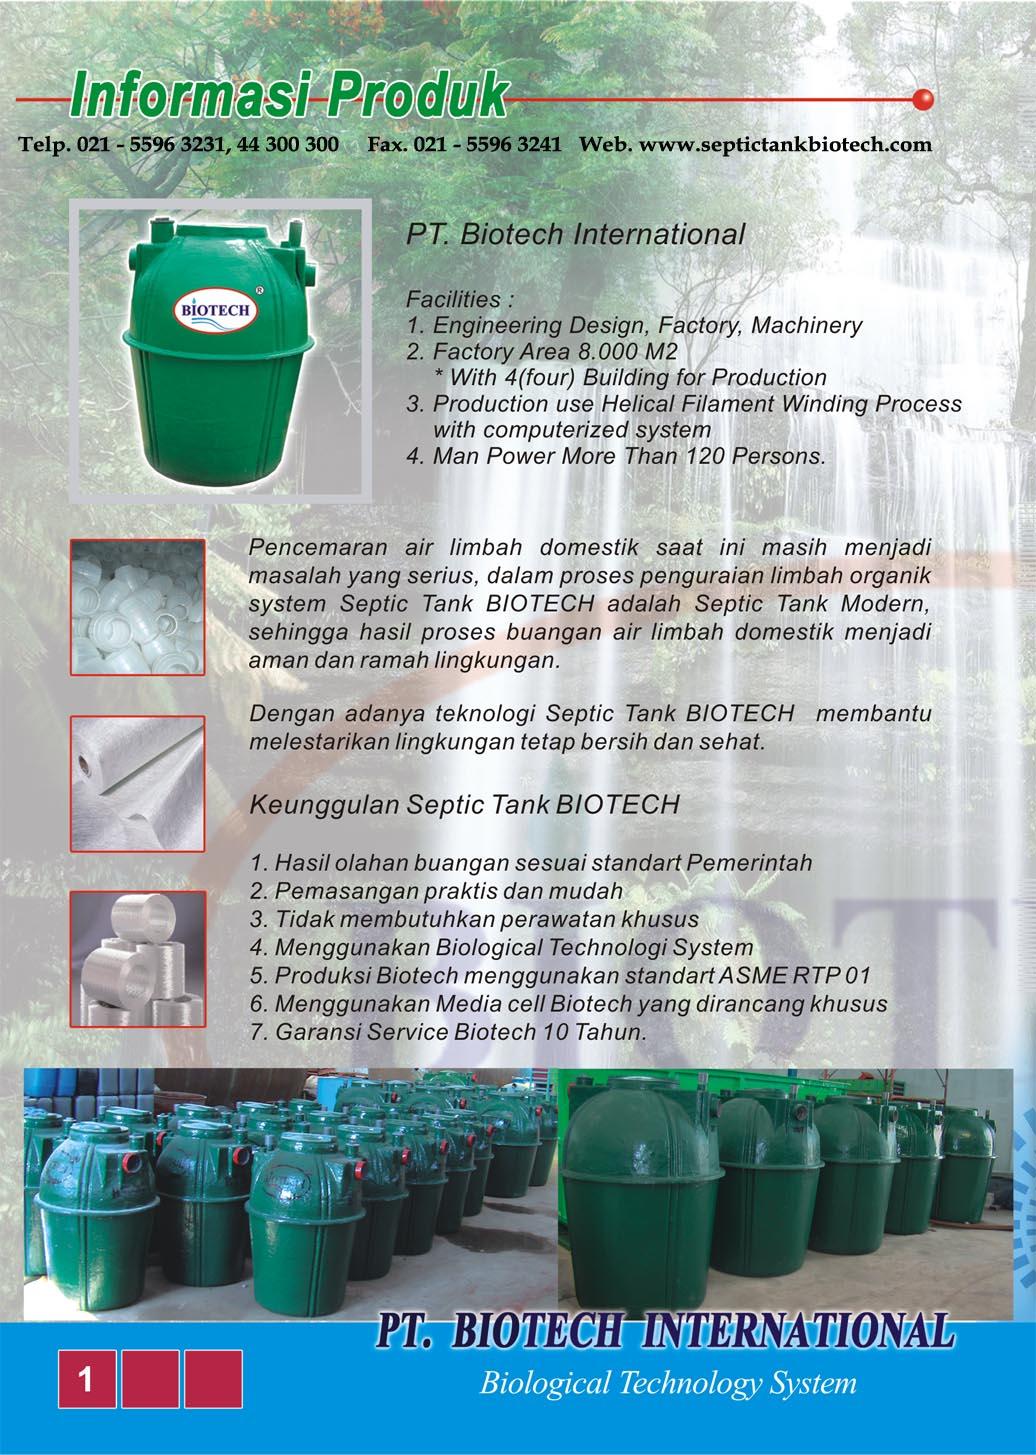 informasi produk septic tank biotech